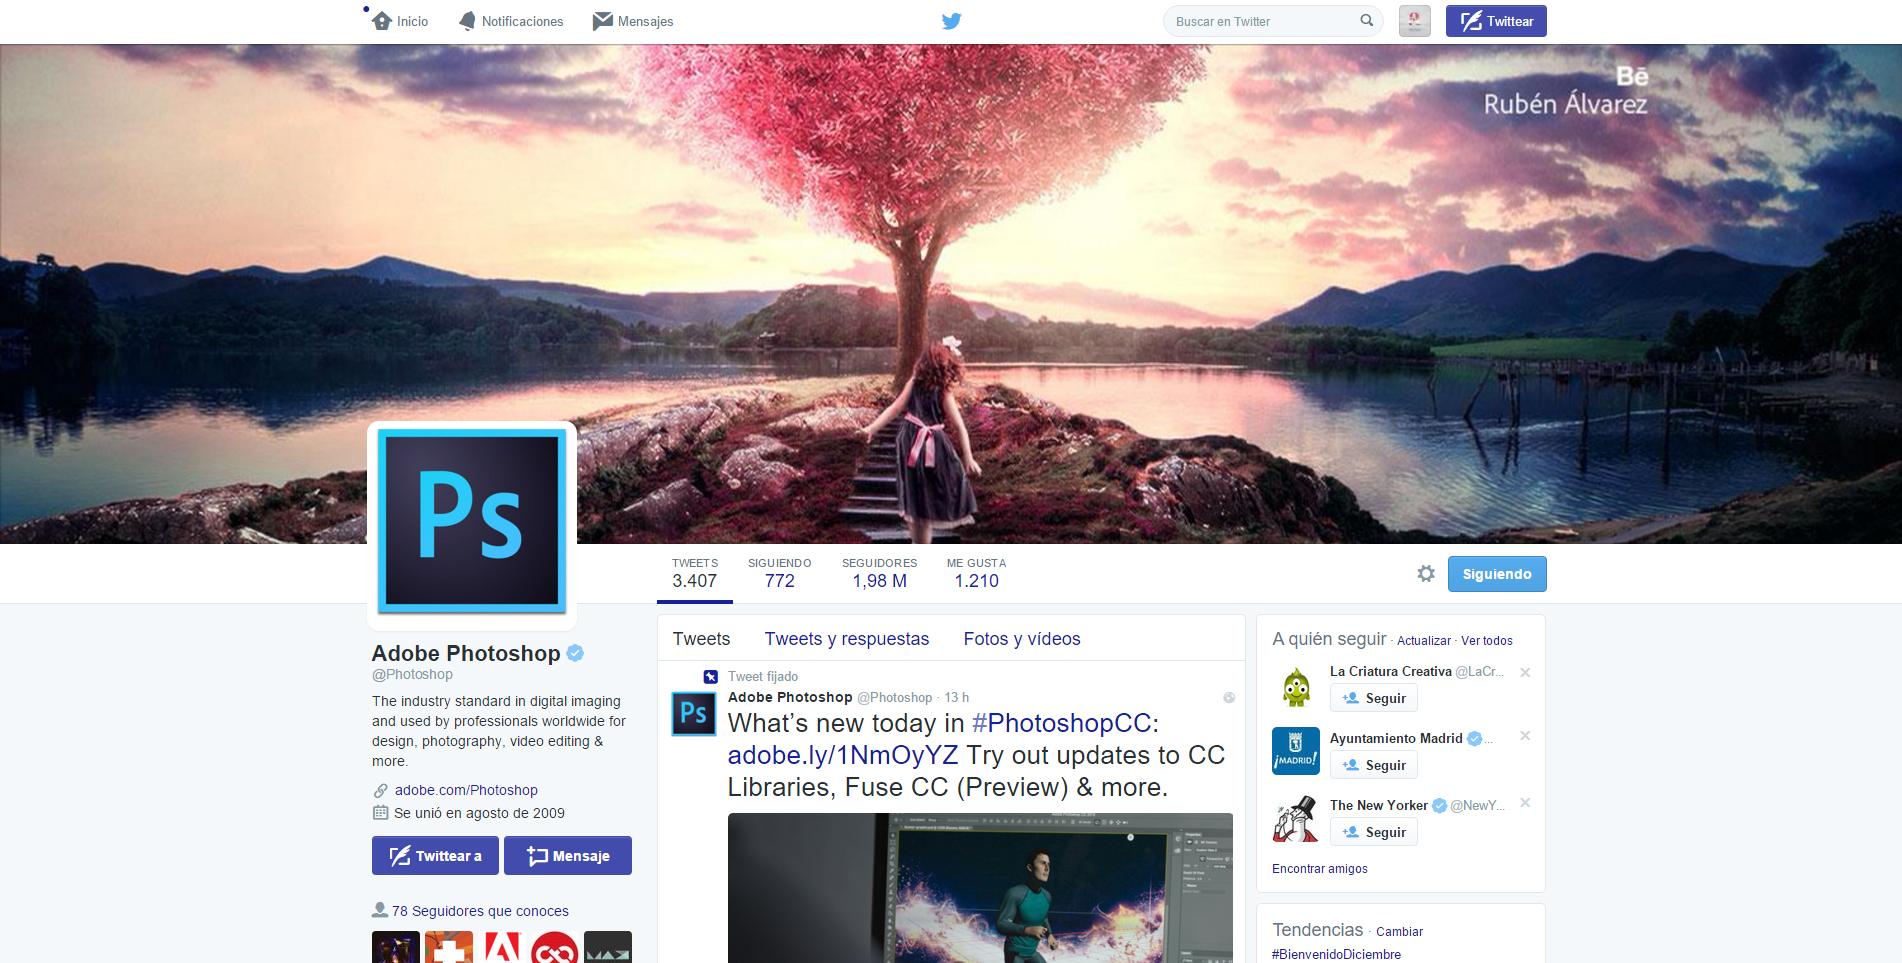 Adobe Photoshop CC 2015 Splash Screen Image on Behance